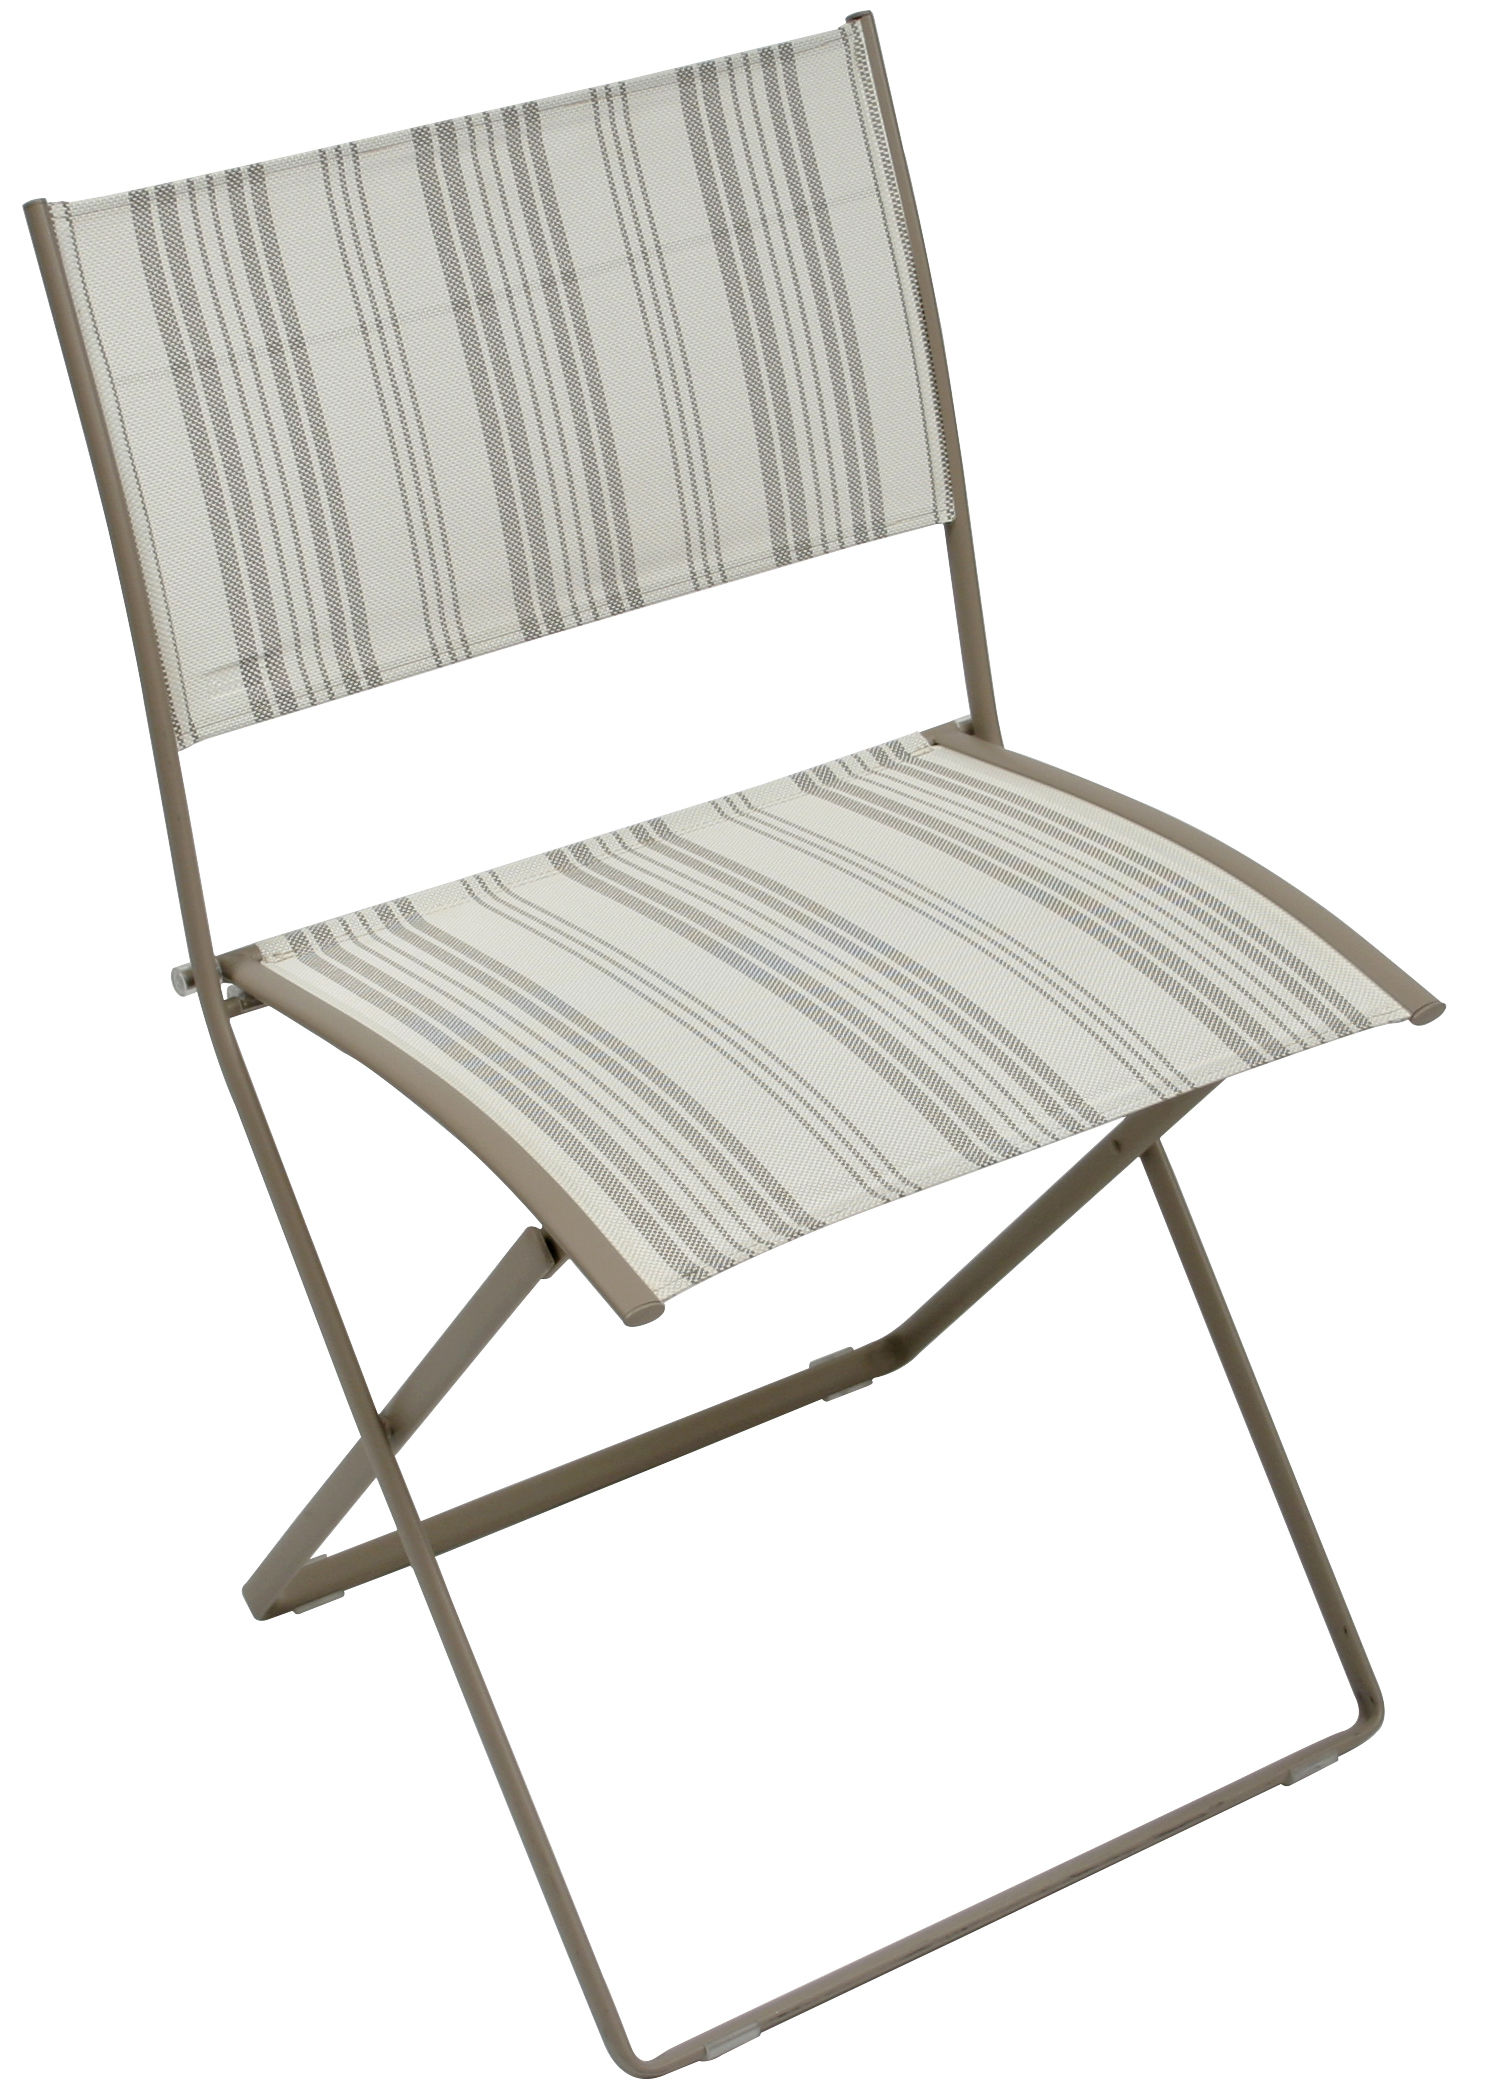 chaise pliante plein air toile toile matelas fermob. Black Bedroom Furniture Sets. Home Design Ideas